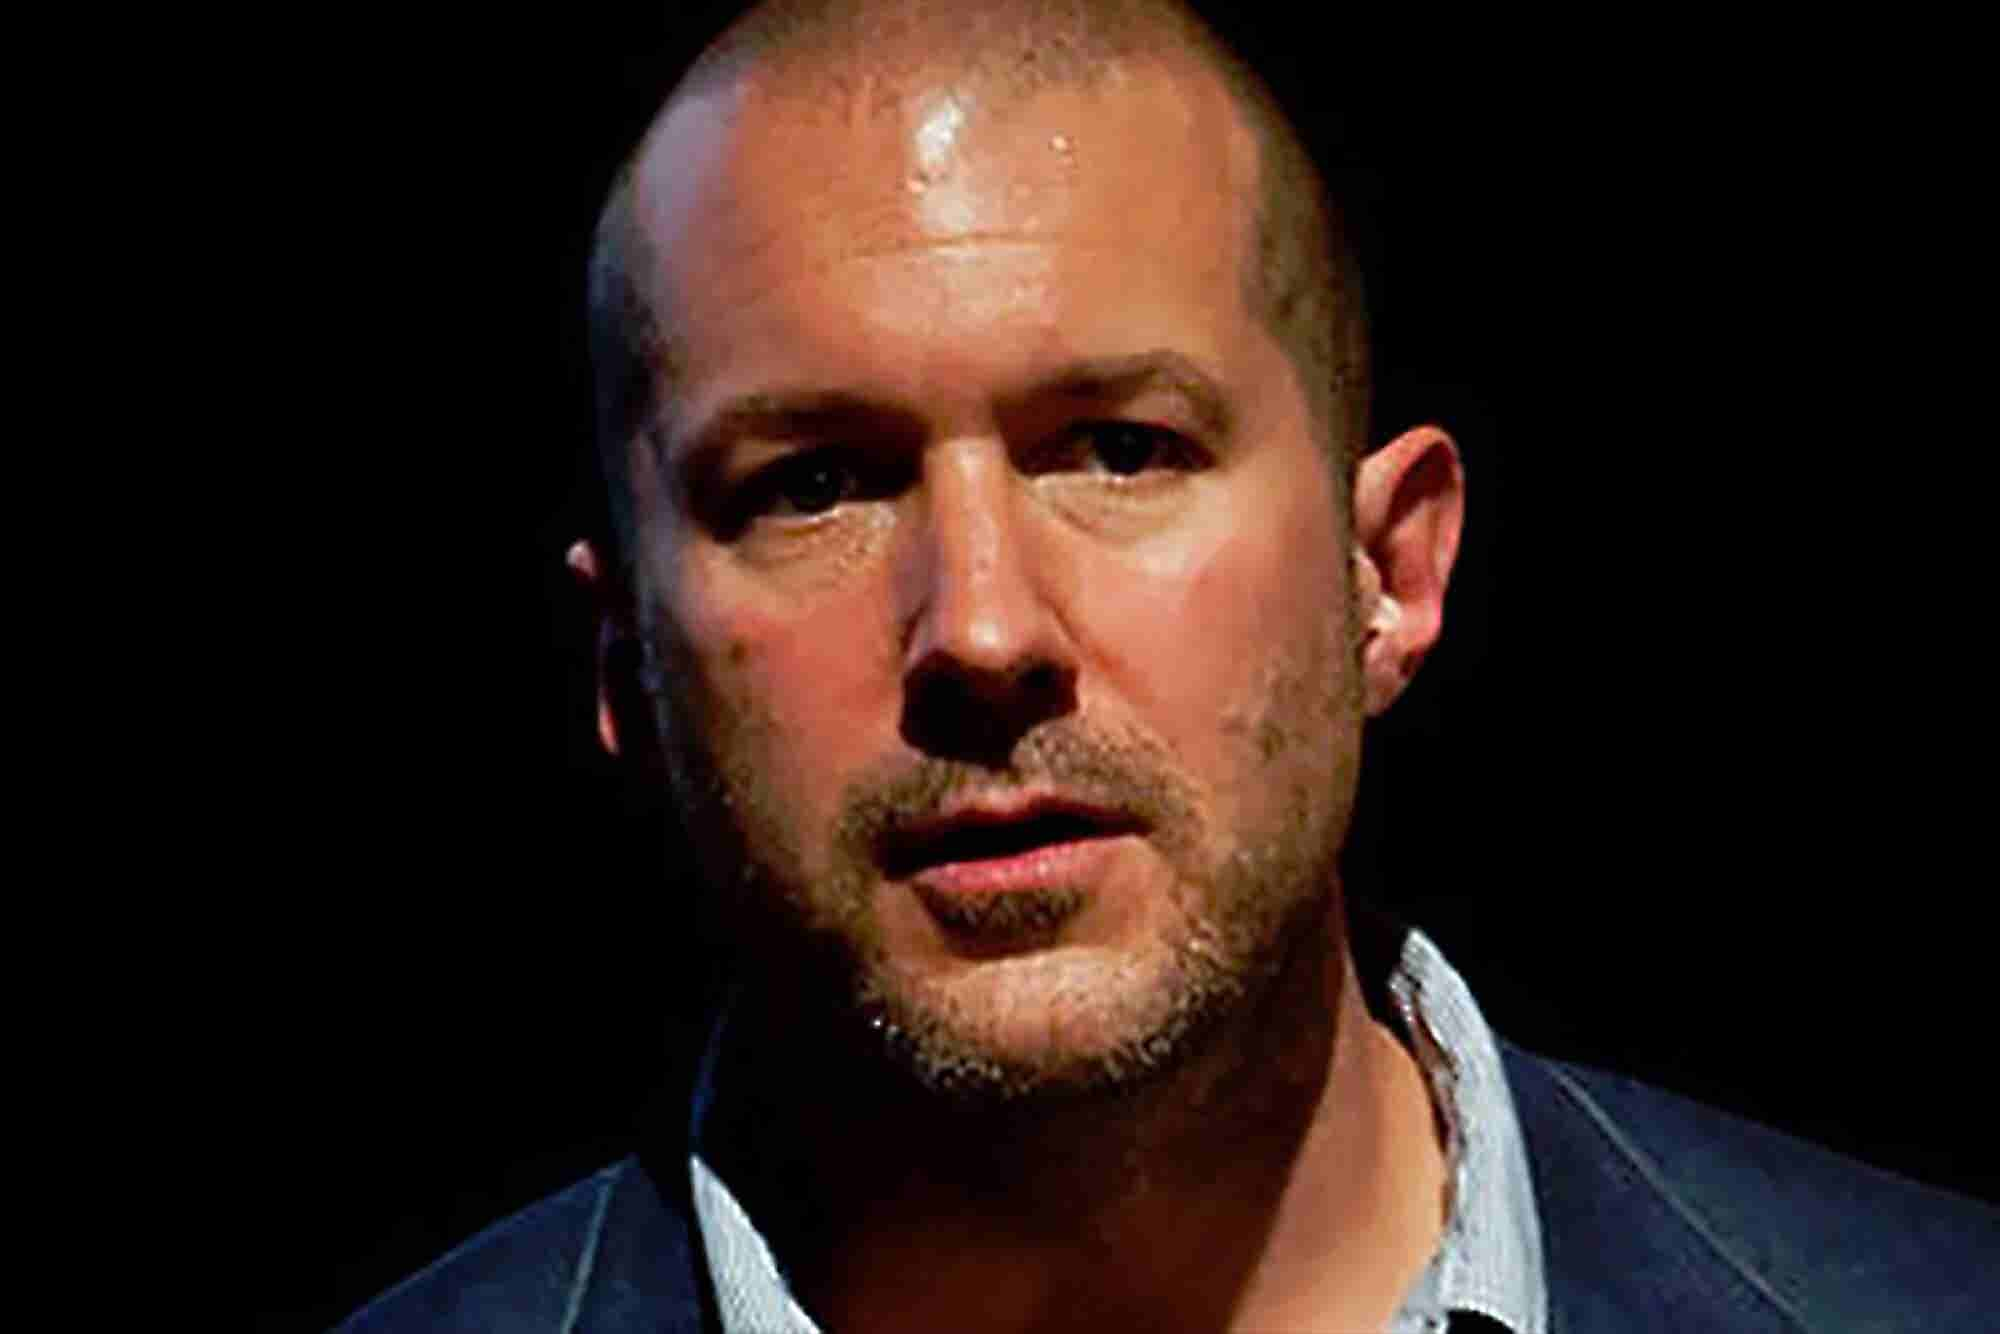 Apple's Design Guru Breaks Decades-Long Silence